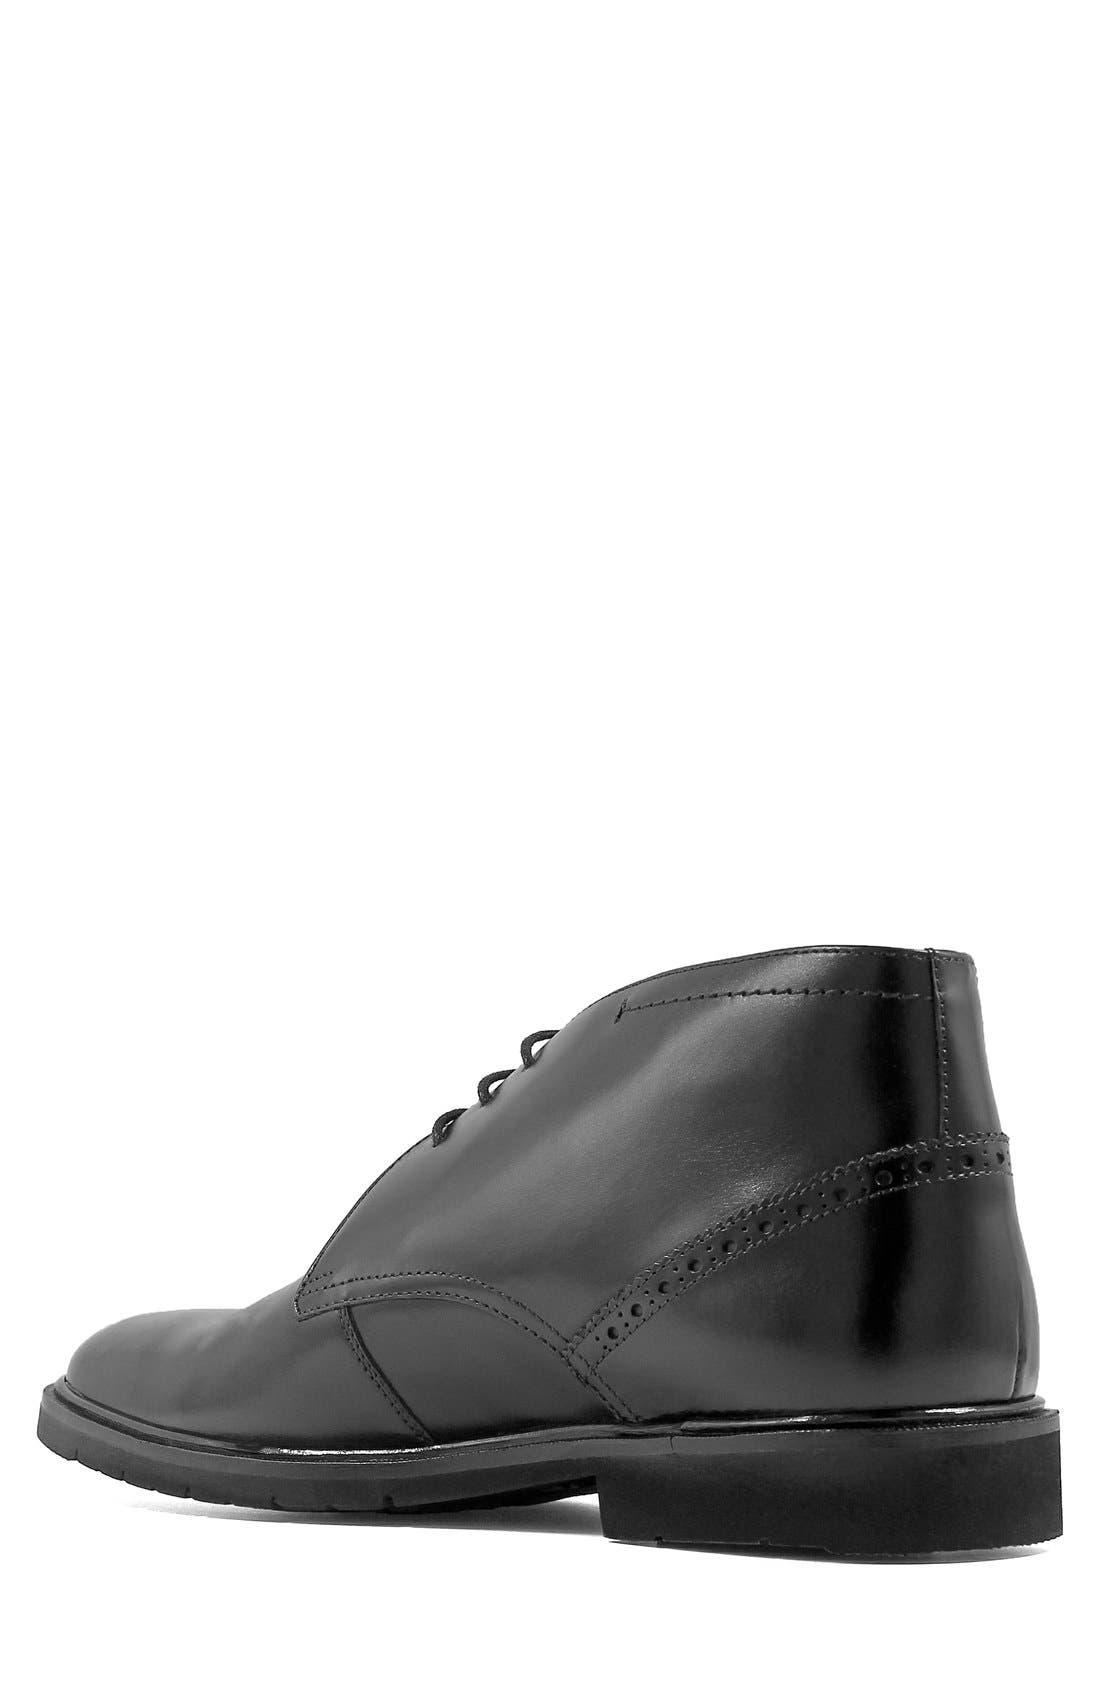 Hamilton Chukka Boot,                             Alternate thumbnail 2, color,                             001